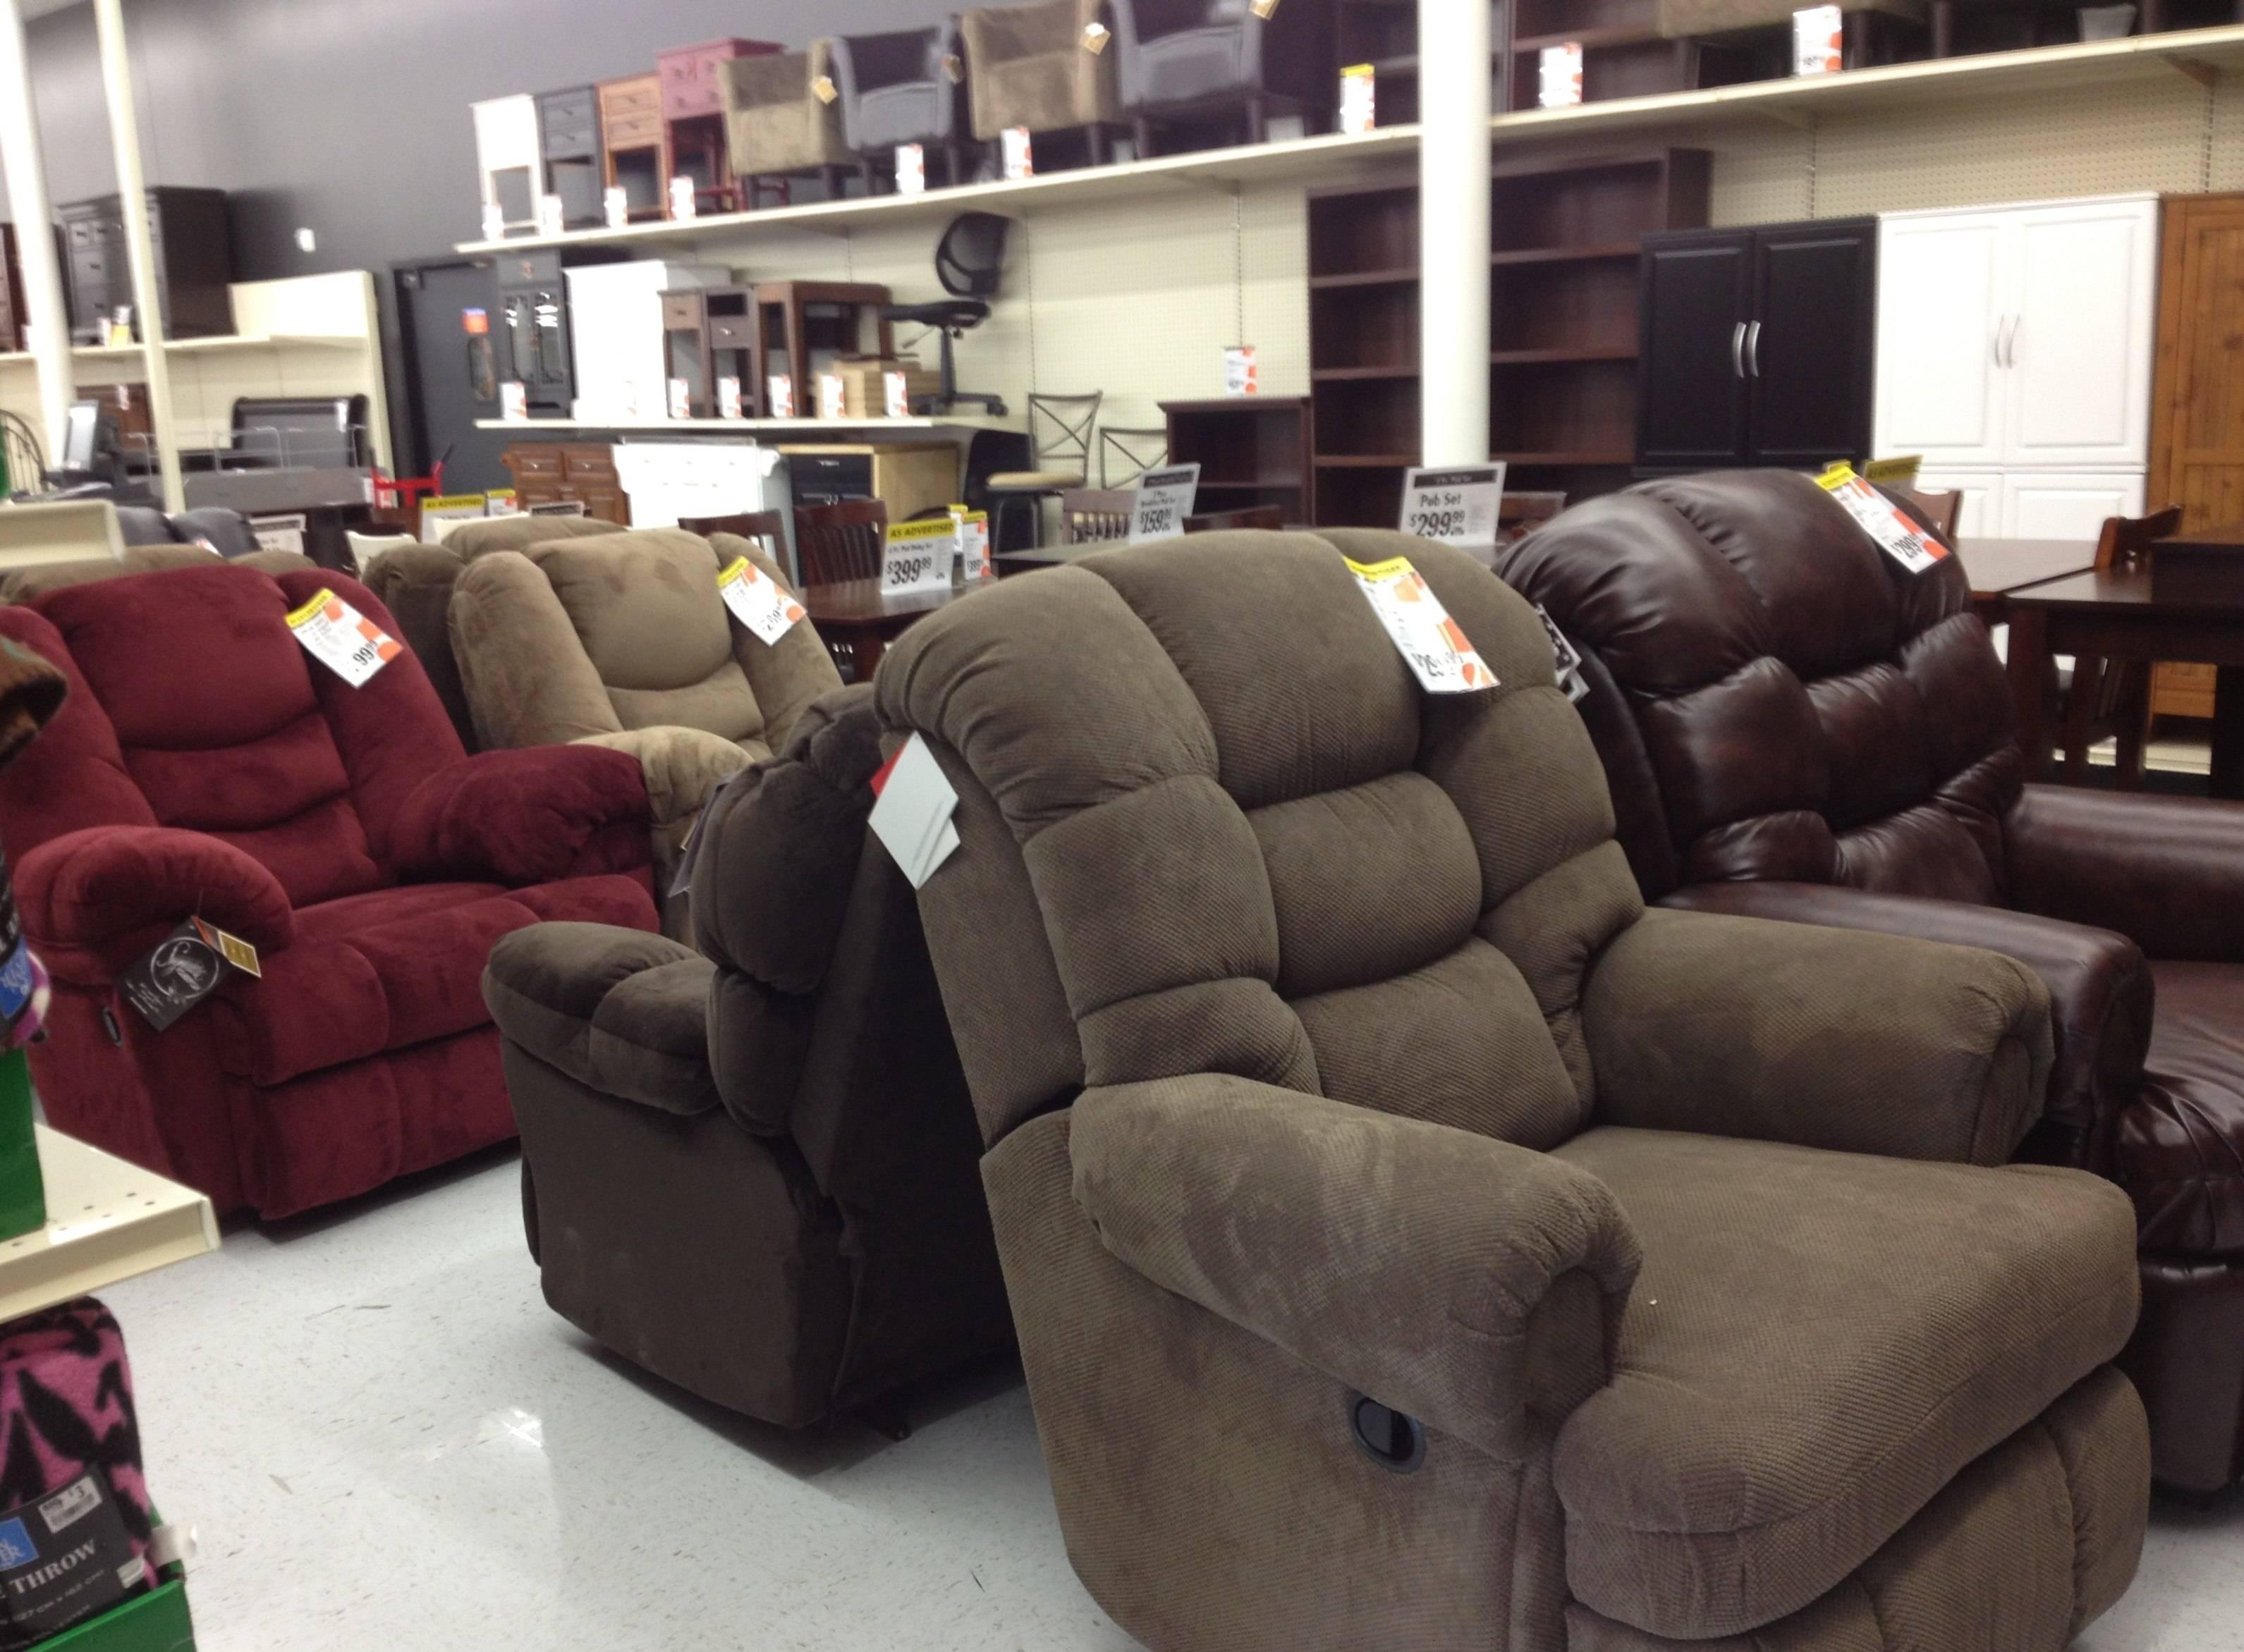 Sofa Big Lots pertaining to Big Lots Sofas (Image 21 of 30)